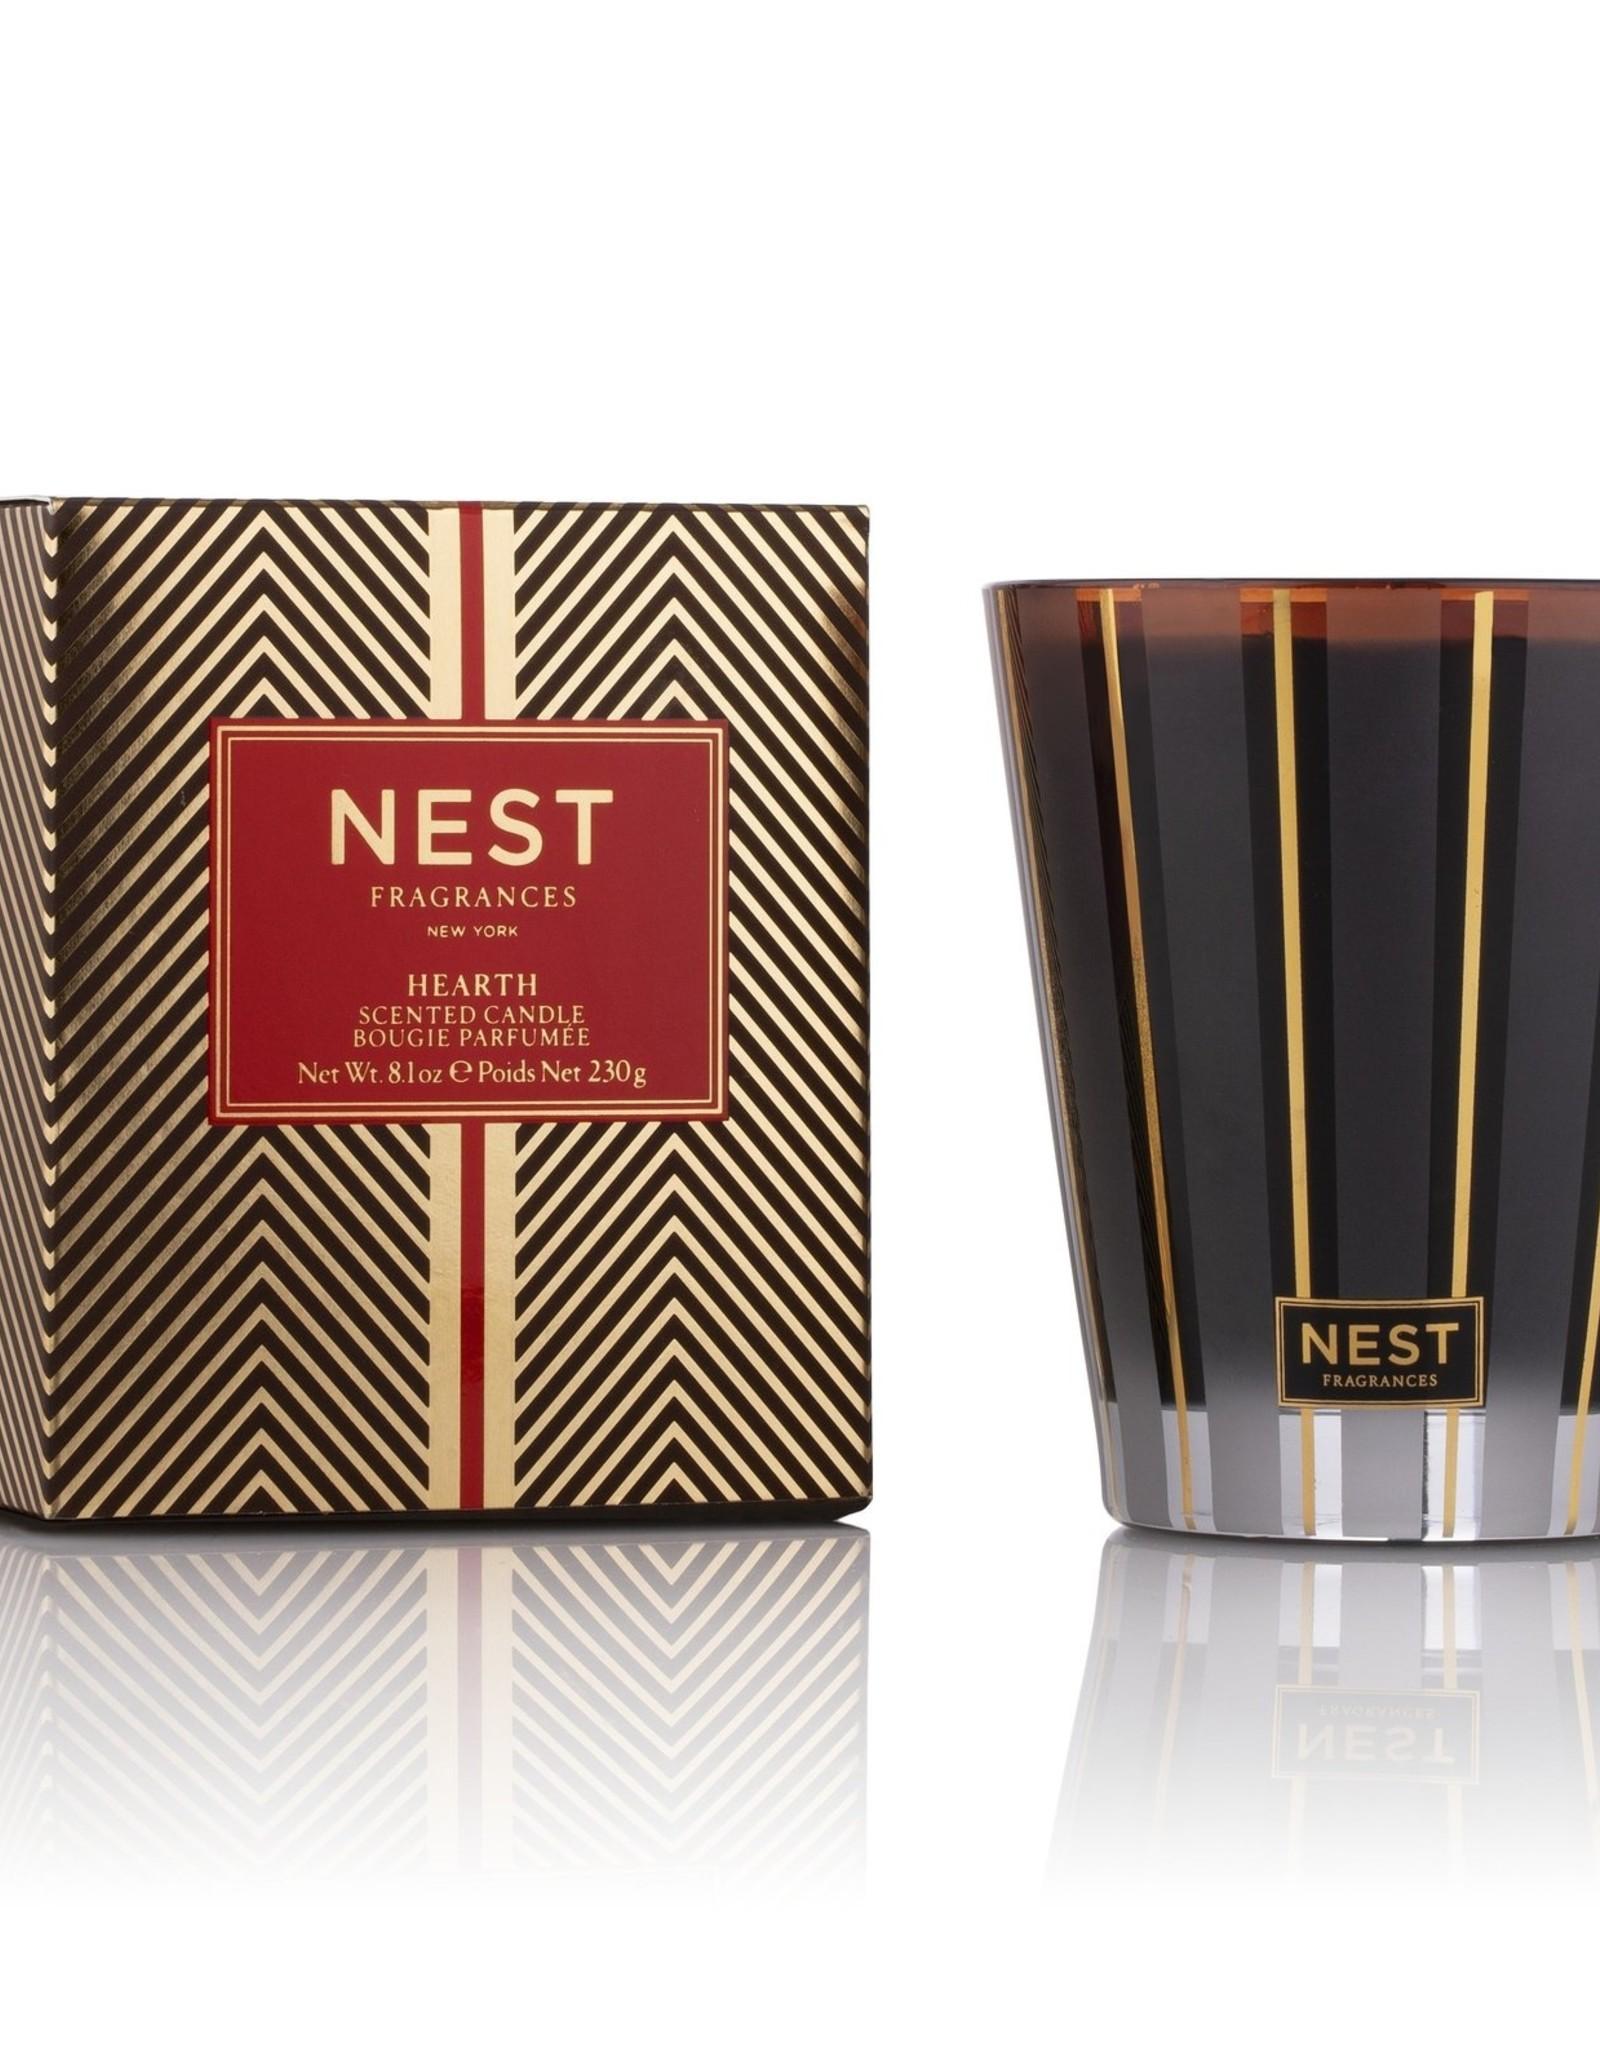 Nest Fragrances Hearth Candle 8.1oz